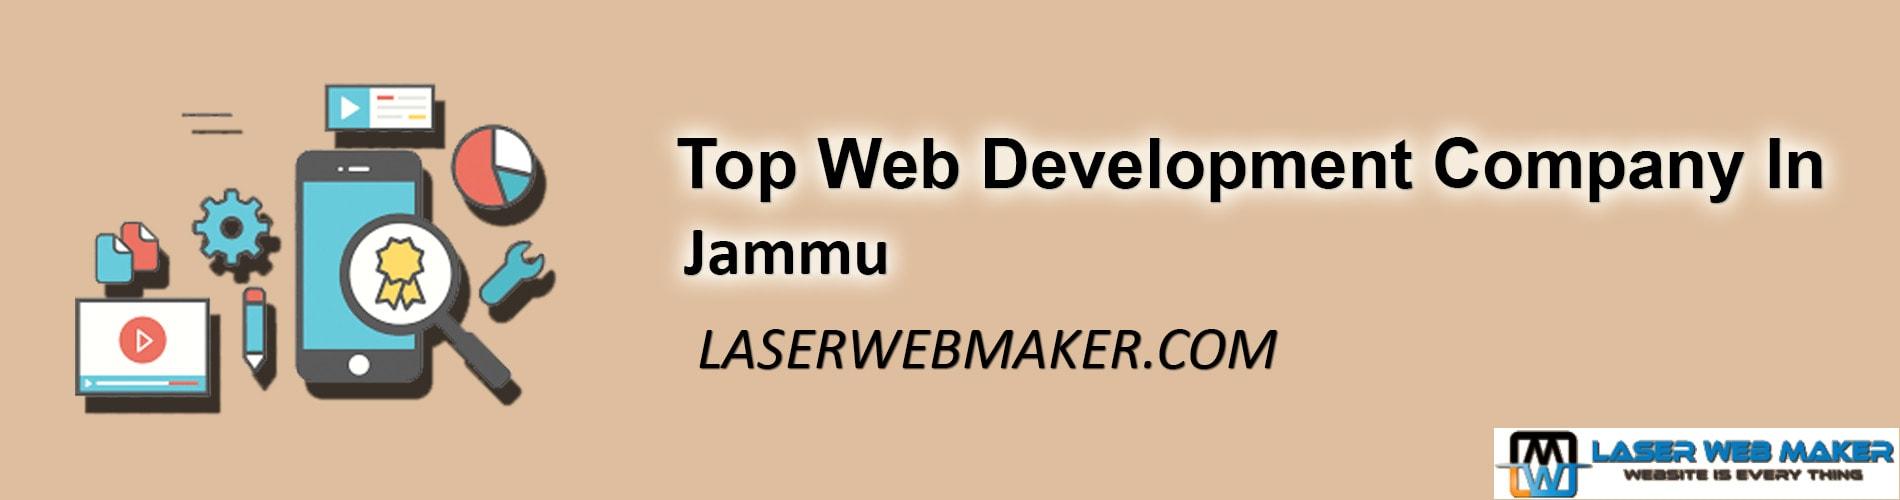 Top Web Development Company In Jammu